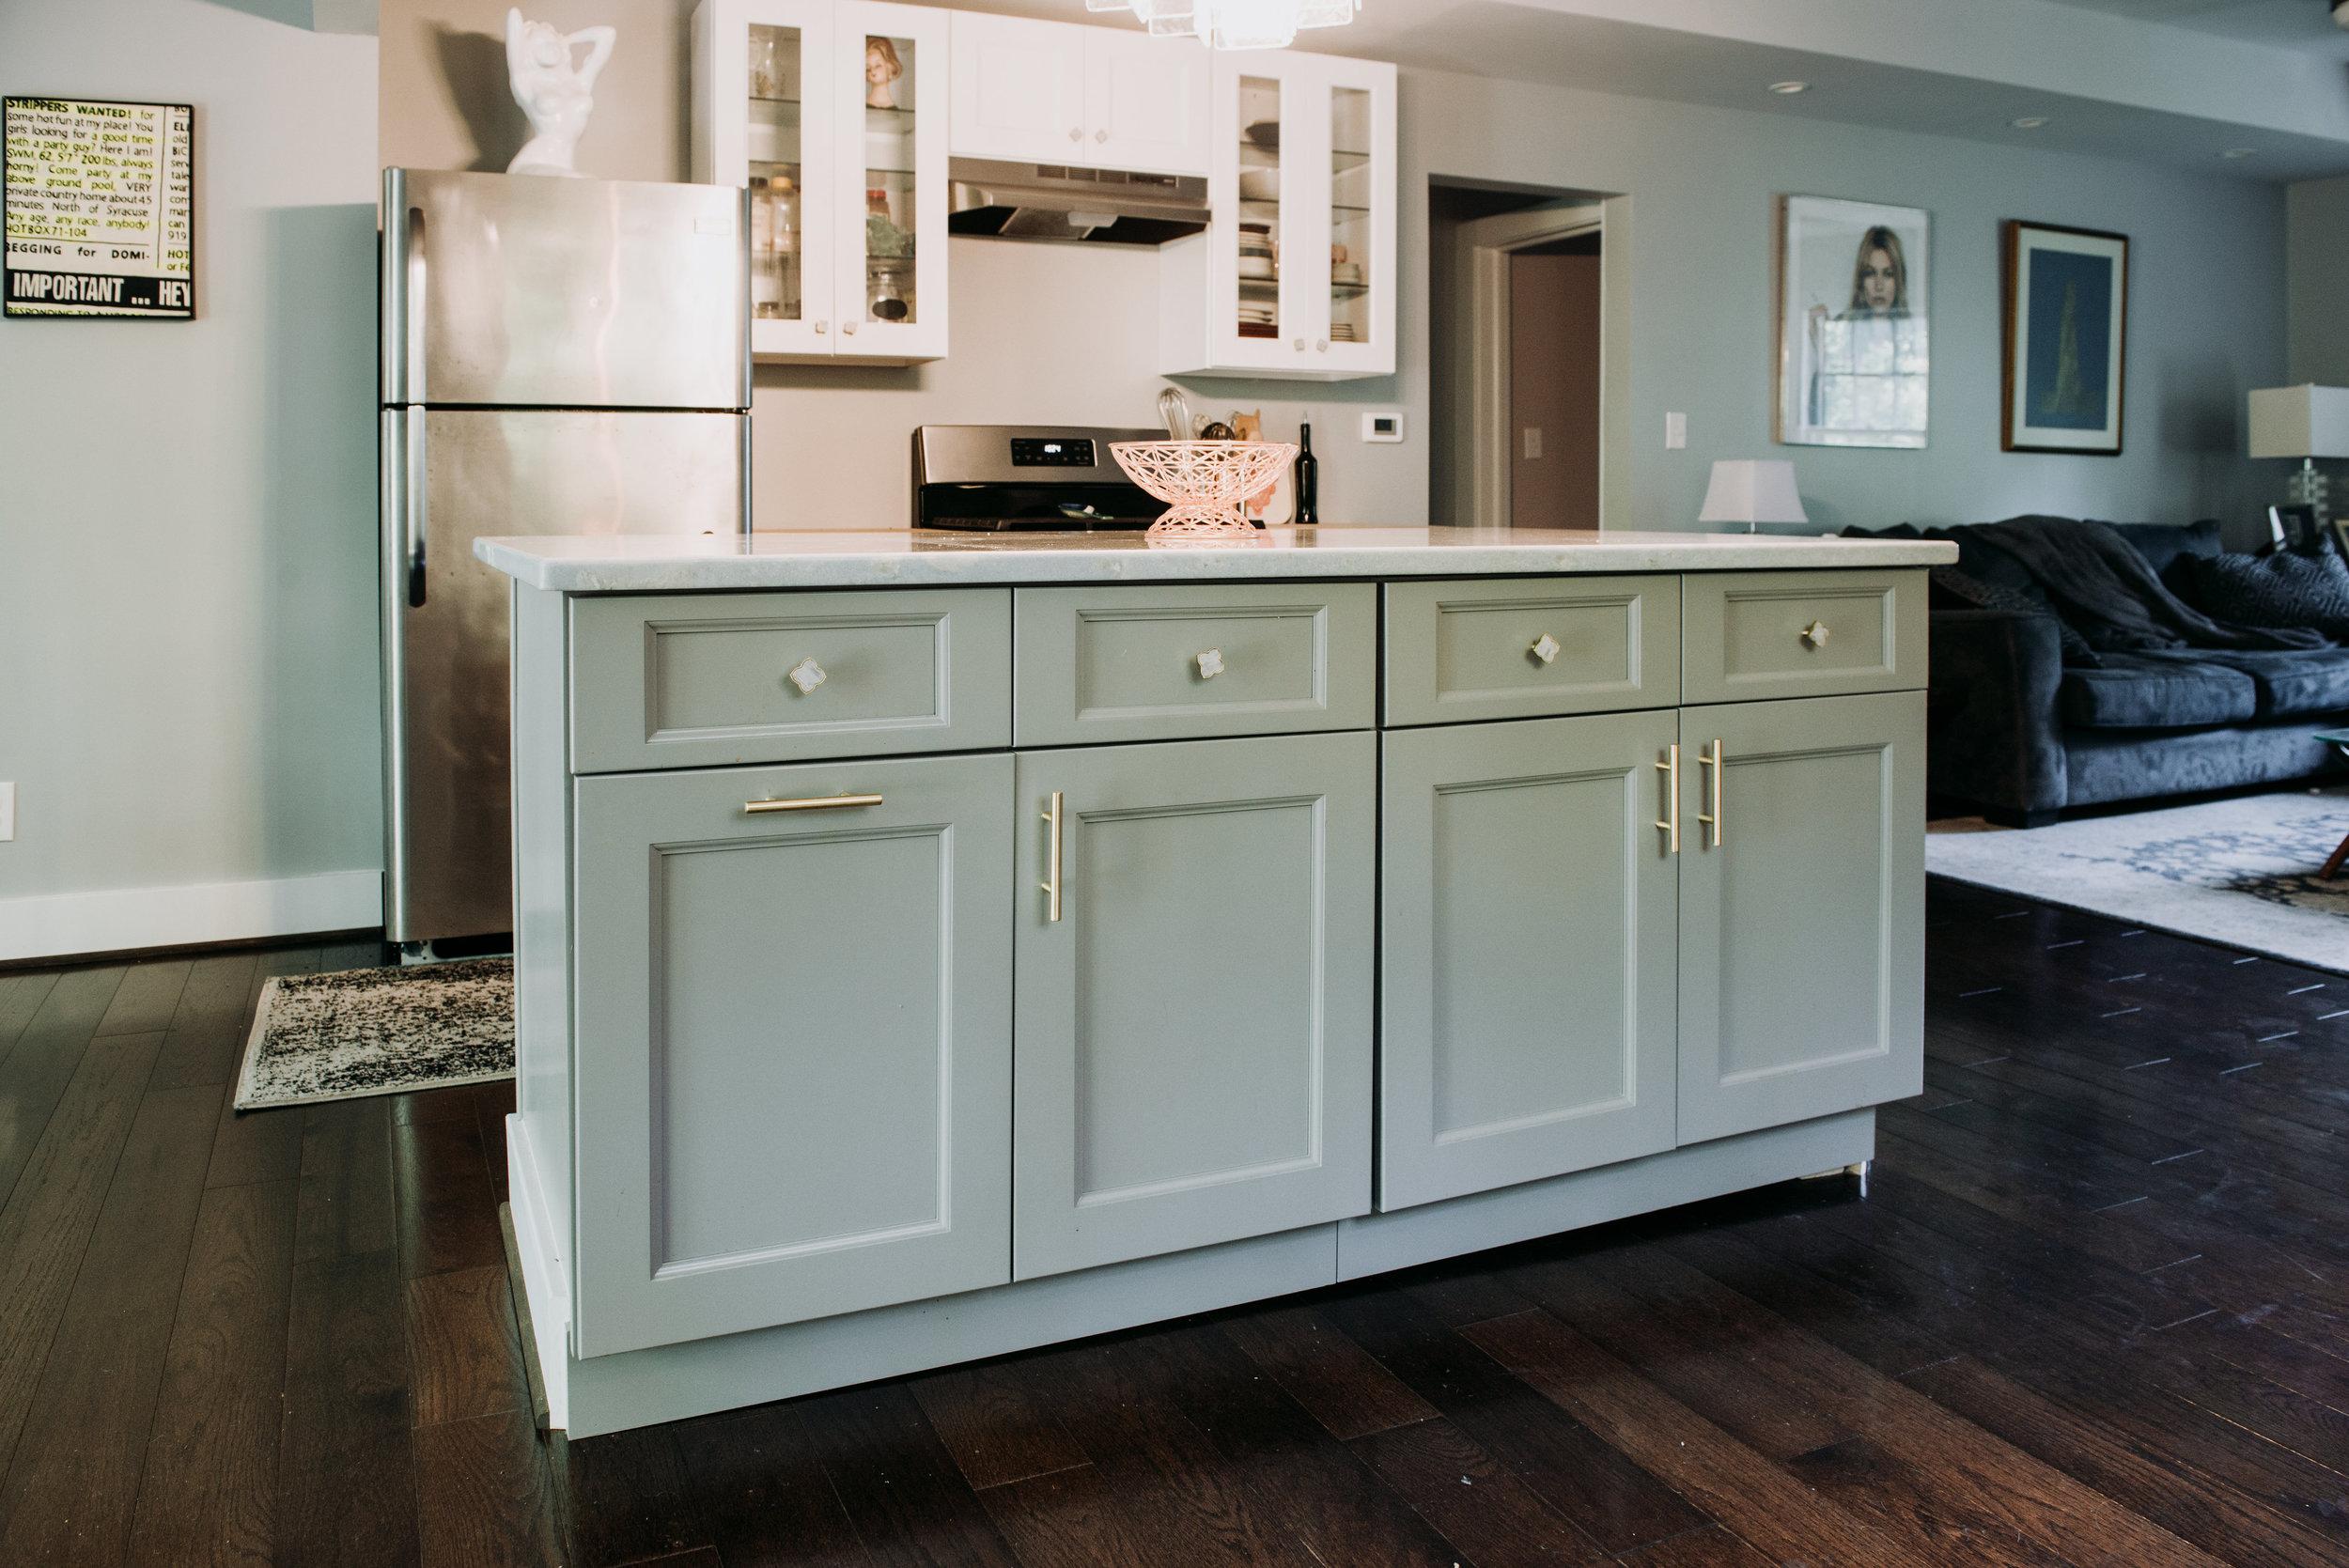 Kitchen Cabinet Remodeler in Buffalo